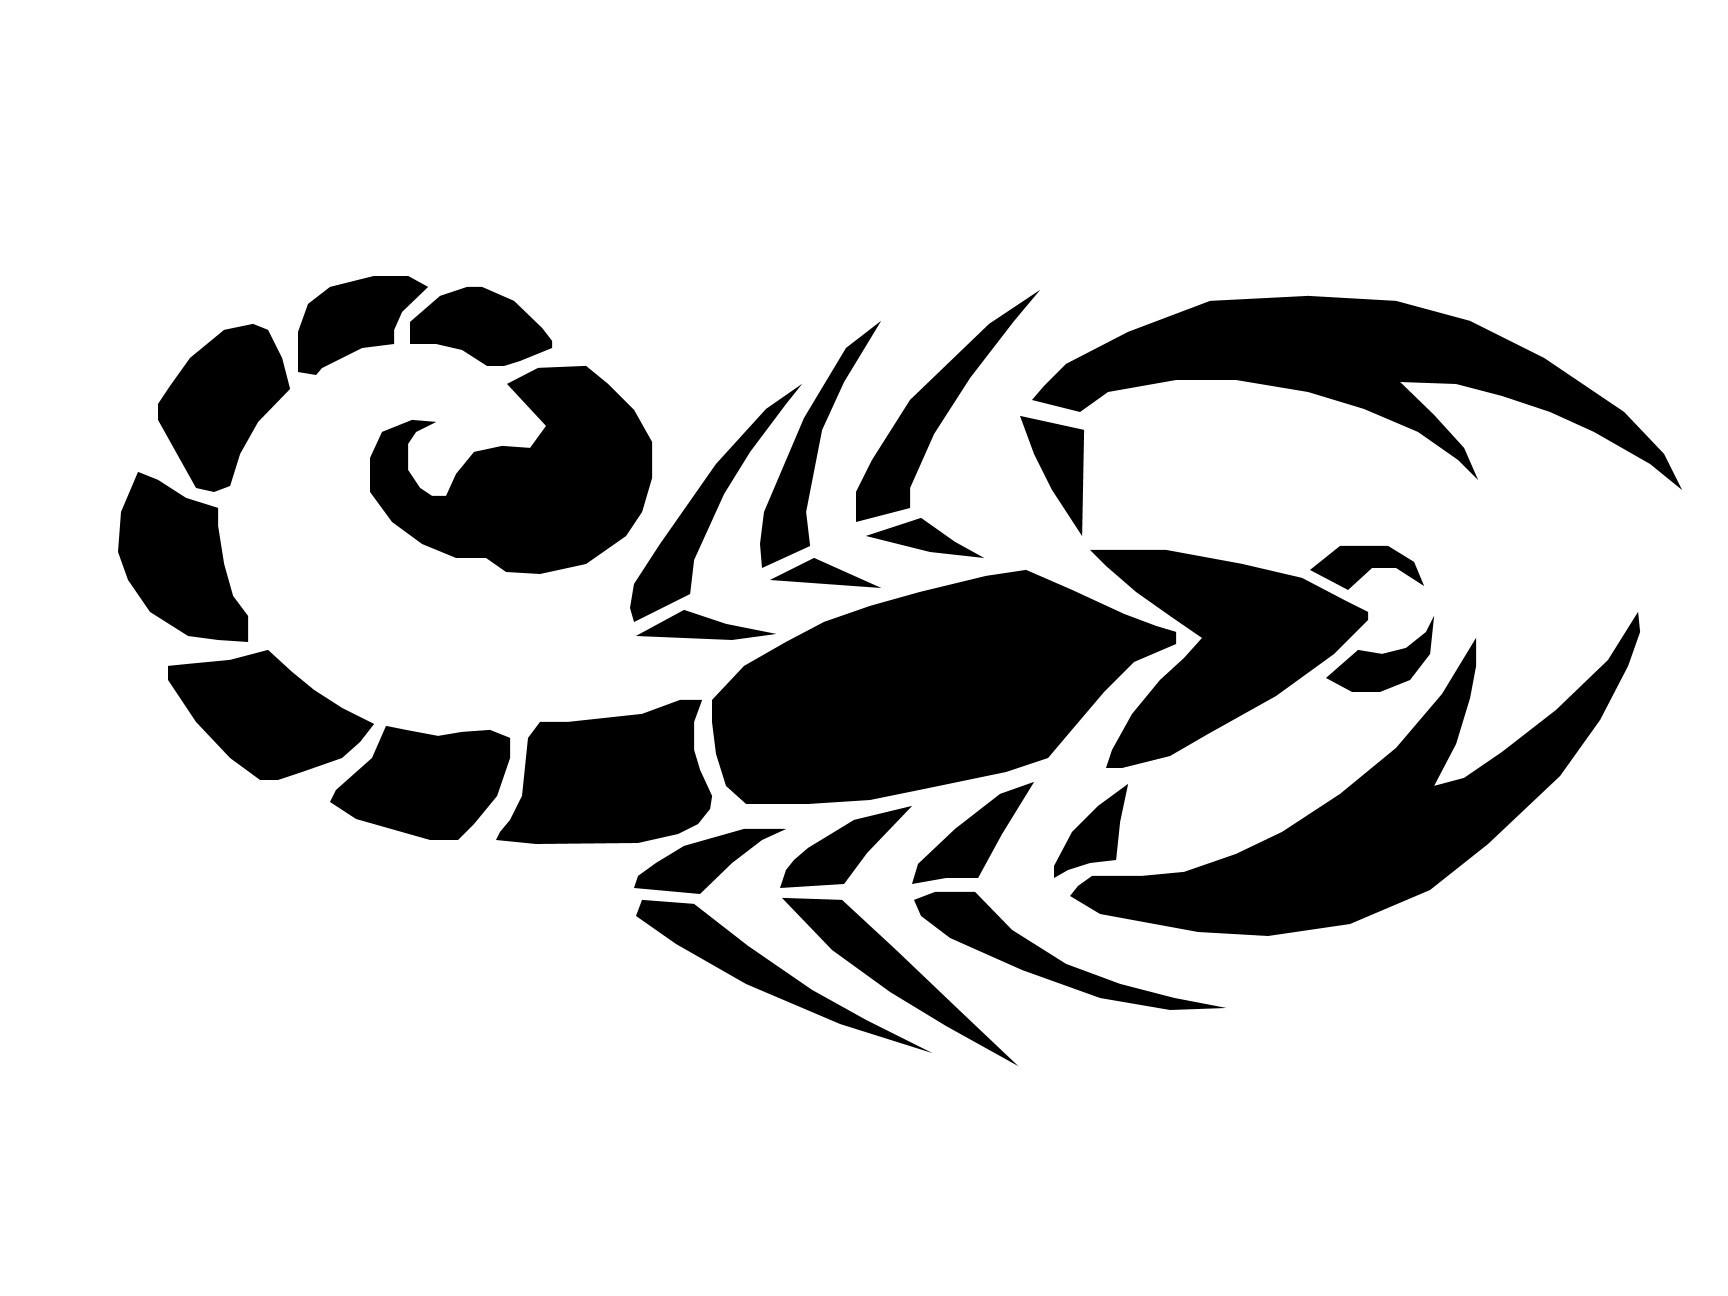 Scorpion Tattoos PNG - 10760